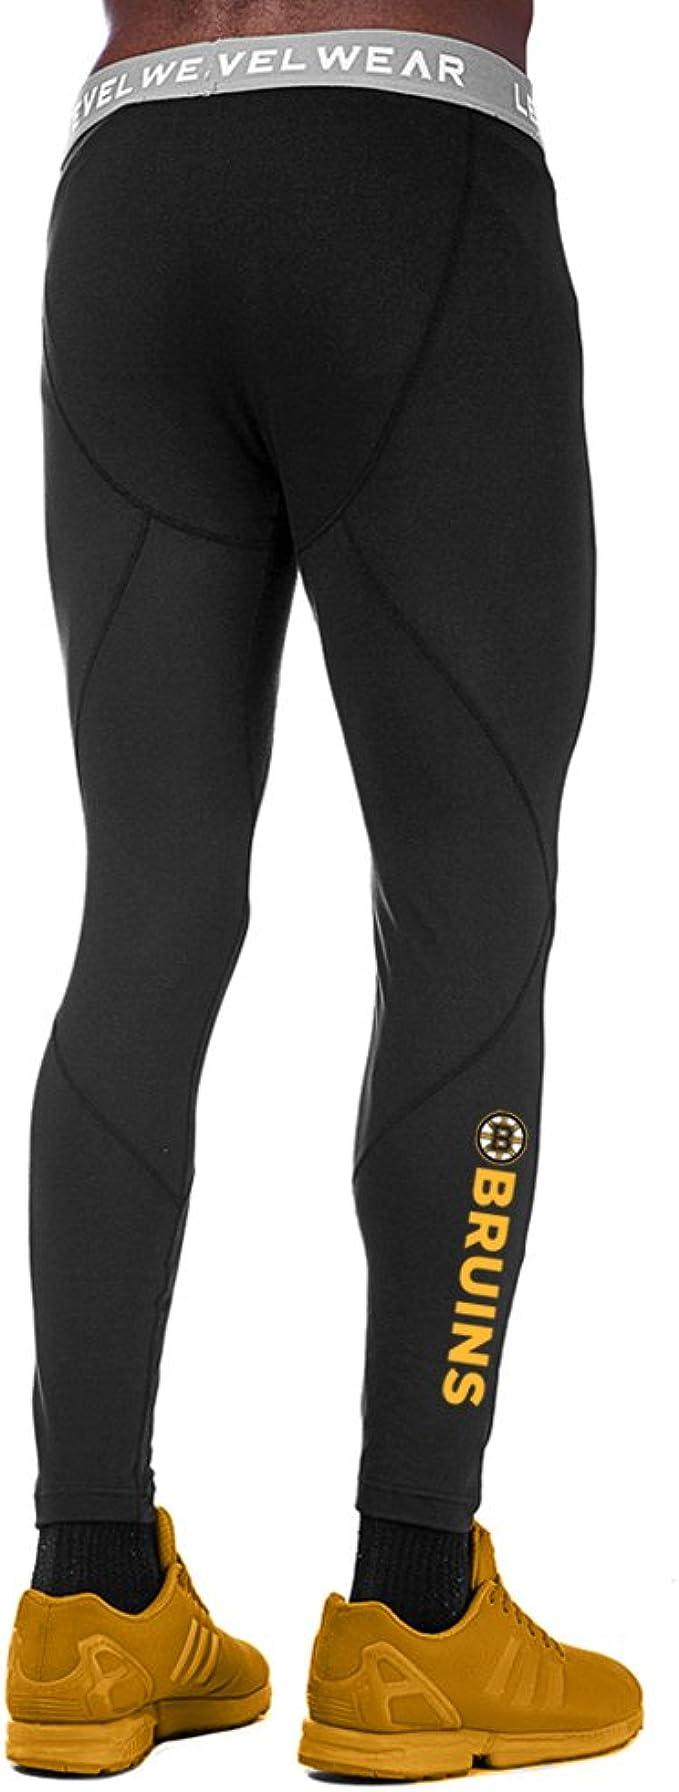 Levelwear LEY9R Jr Prism Icon Text Legging